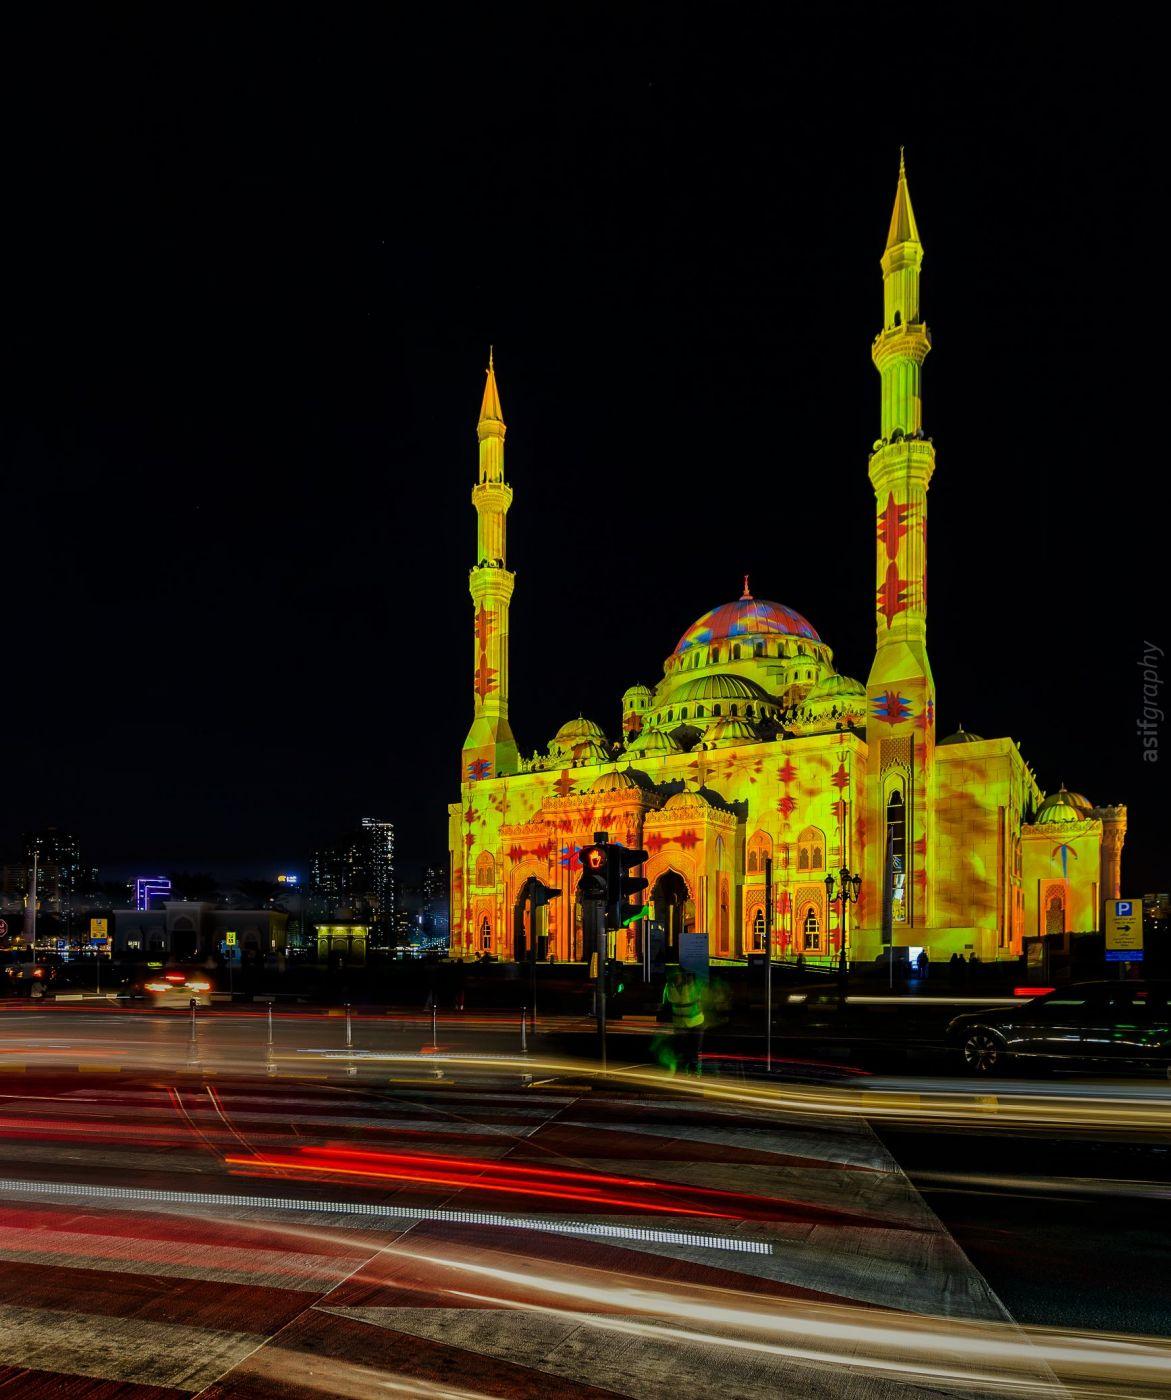 Al Noor Mosque buhaira corniche sharjah, United Arab Emirates